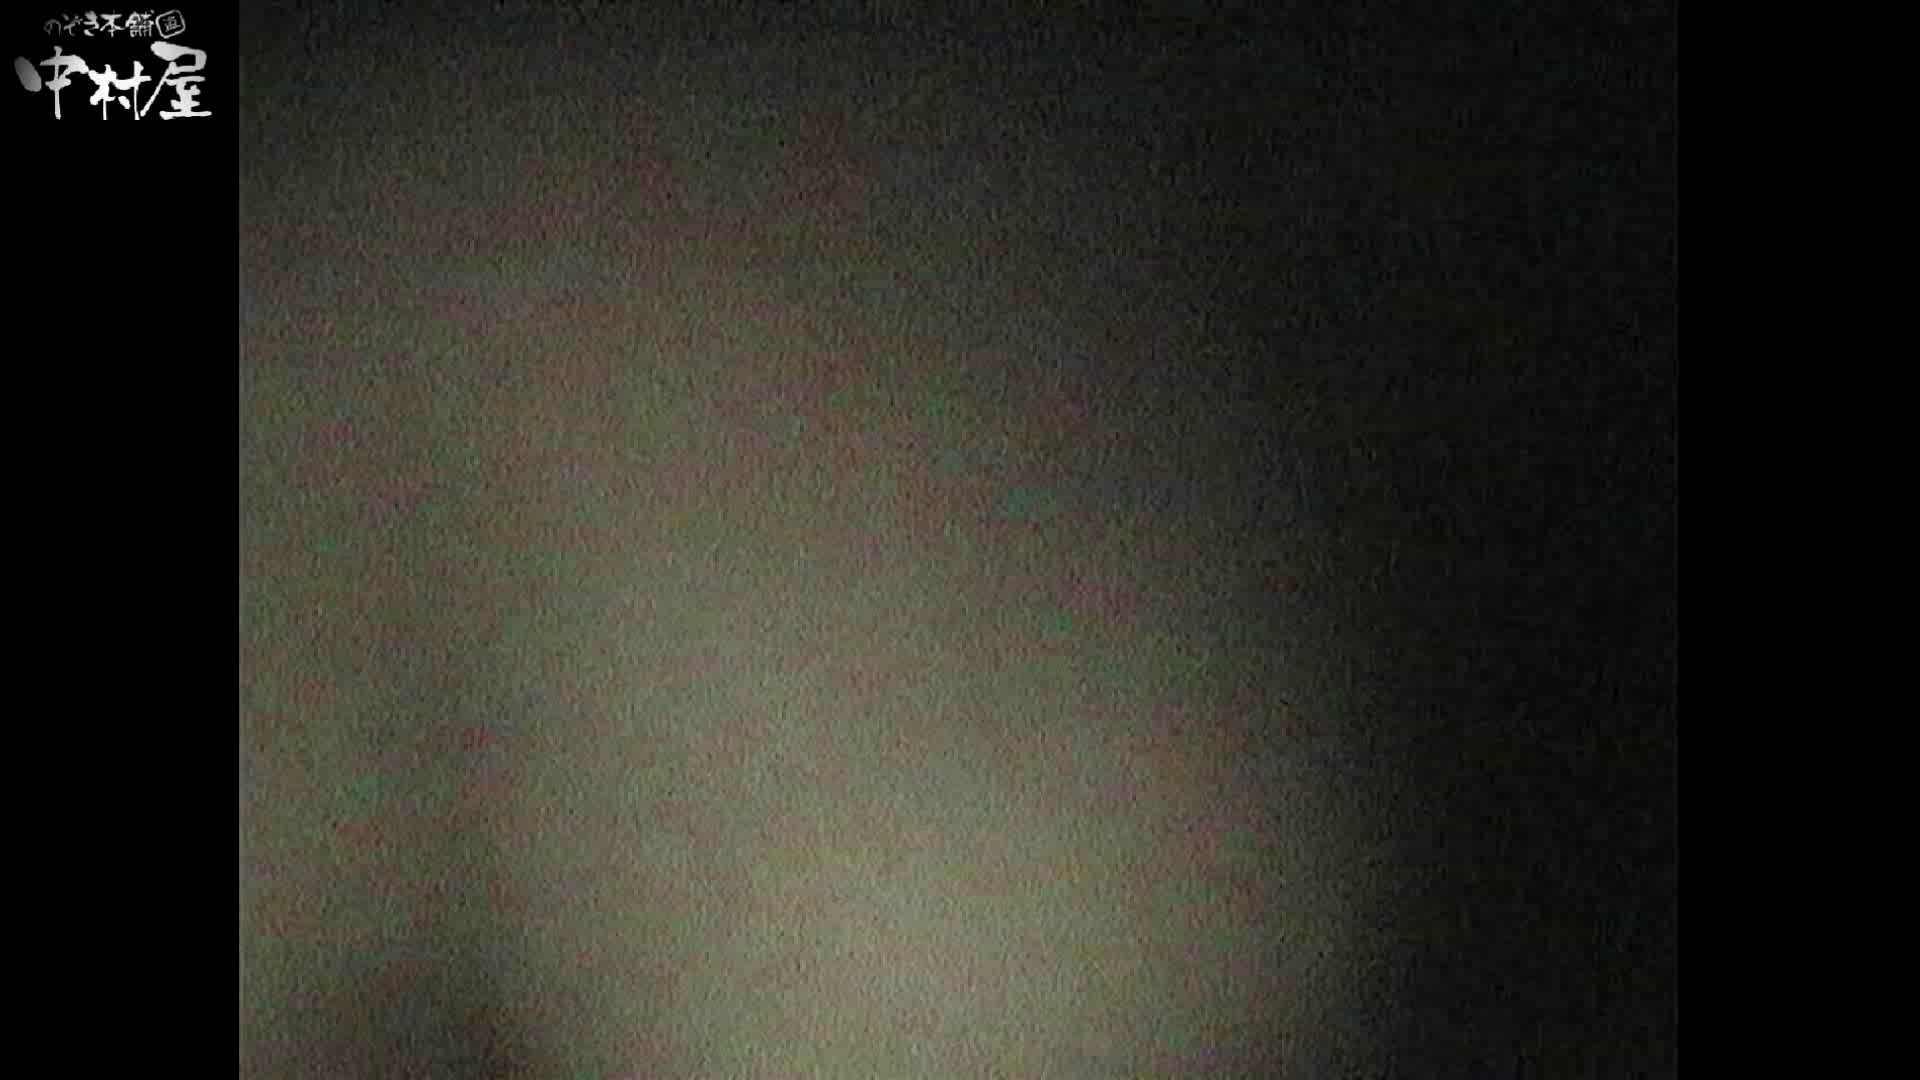 No.16 アニマル柄の水着 レースのパンツにナプキンを装着する金髪お姉さん お姉さんのエロ生活  67連発 4